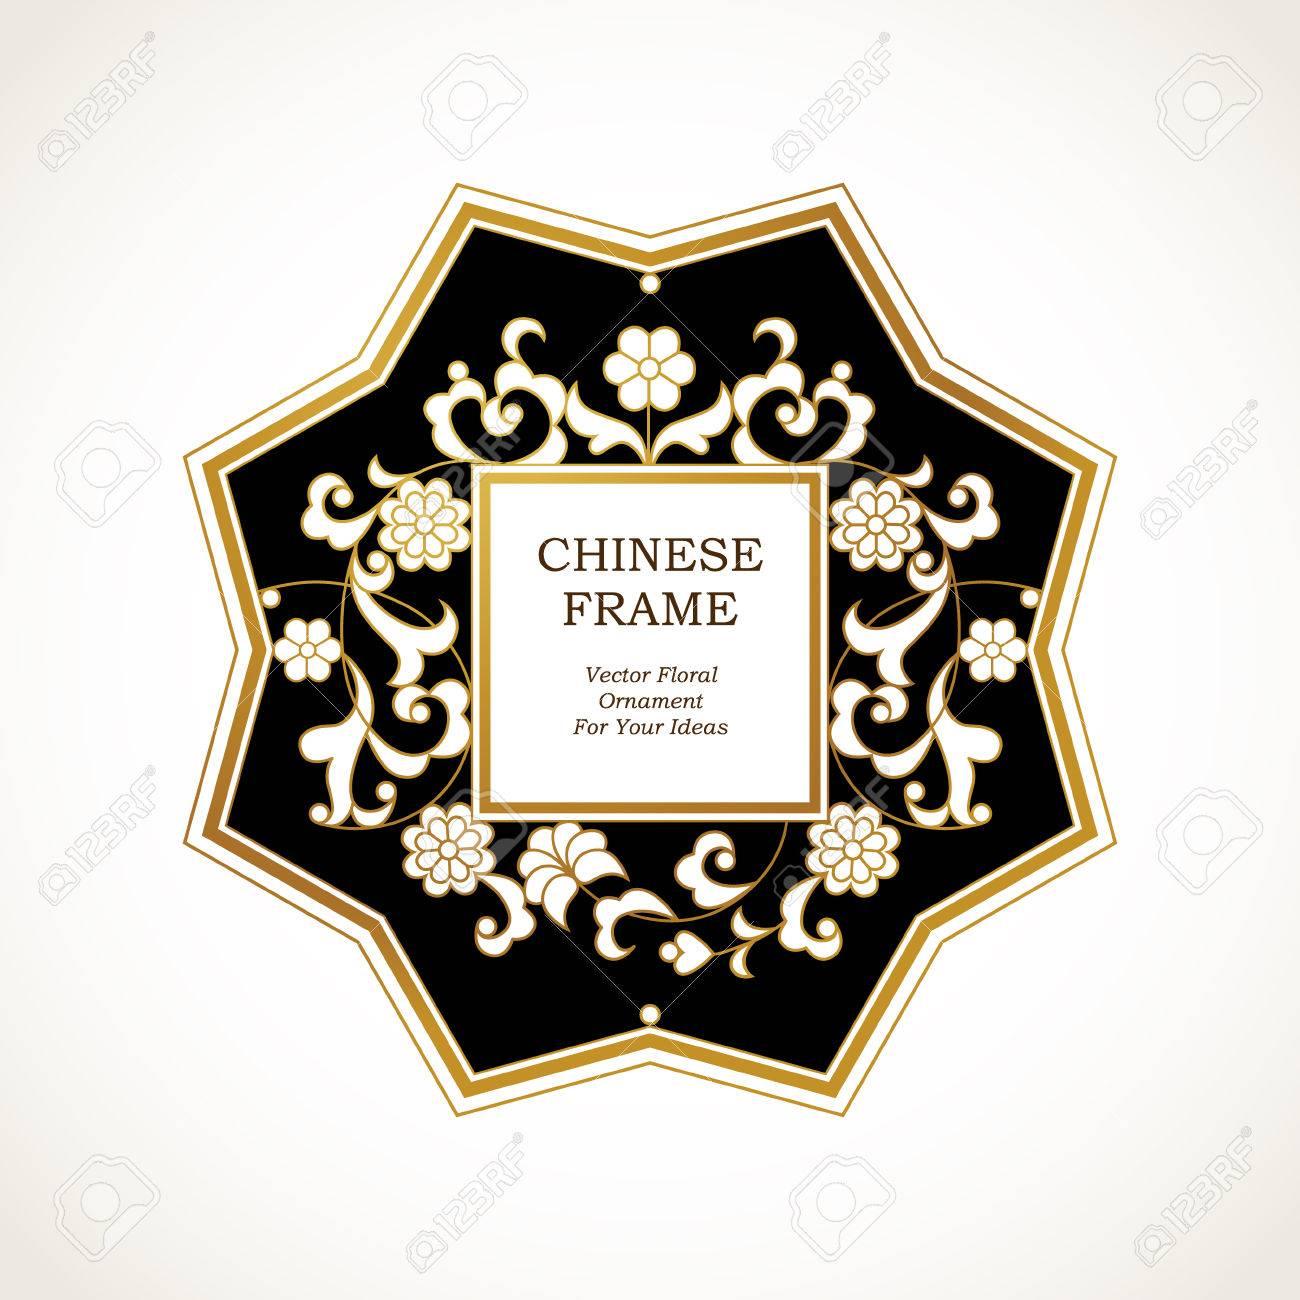 Vector decorative line art frame for design template elegant vector decorative line art frame for design template elegant element in chinese style golden yelopaper Gallery